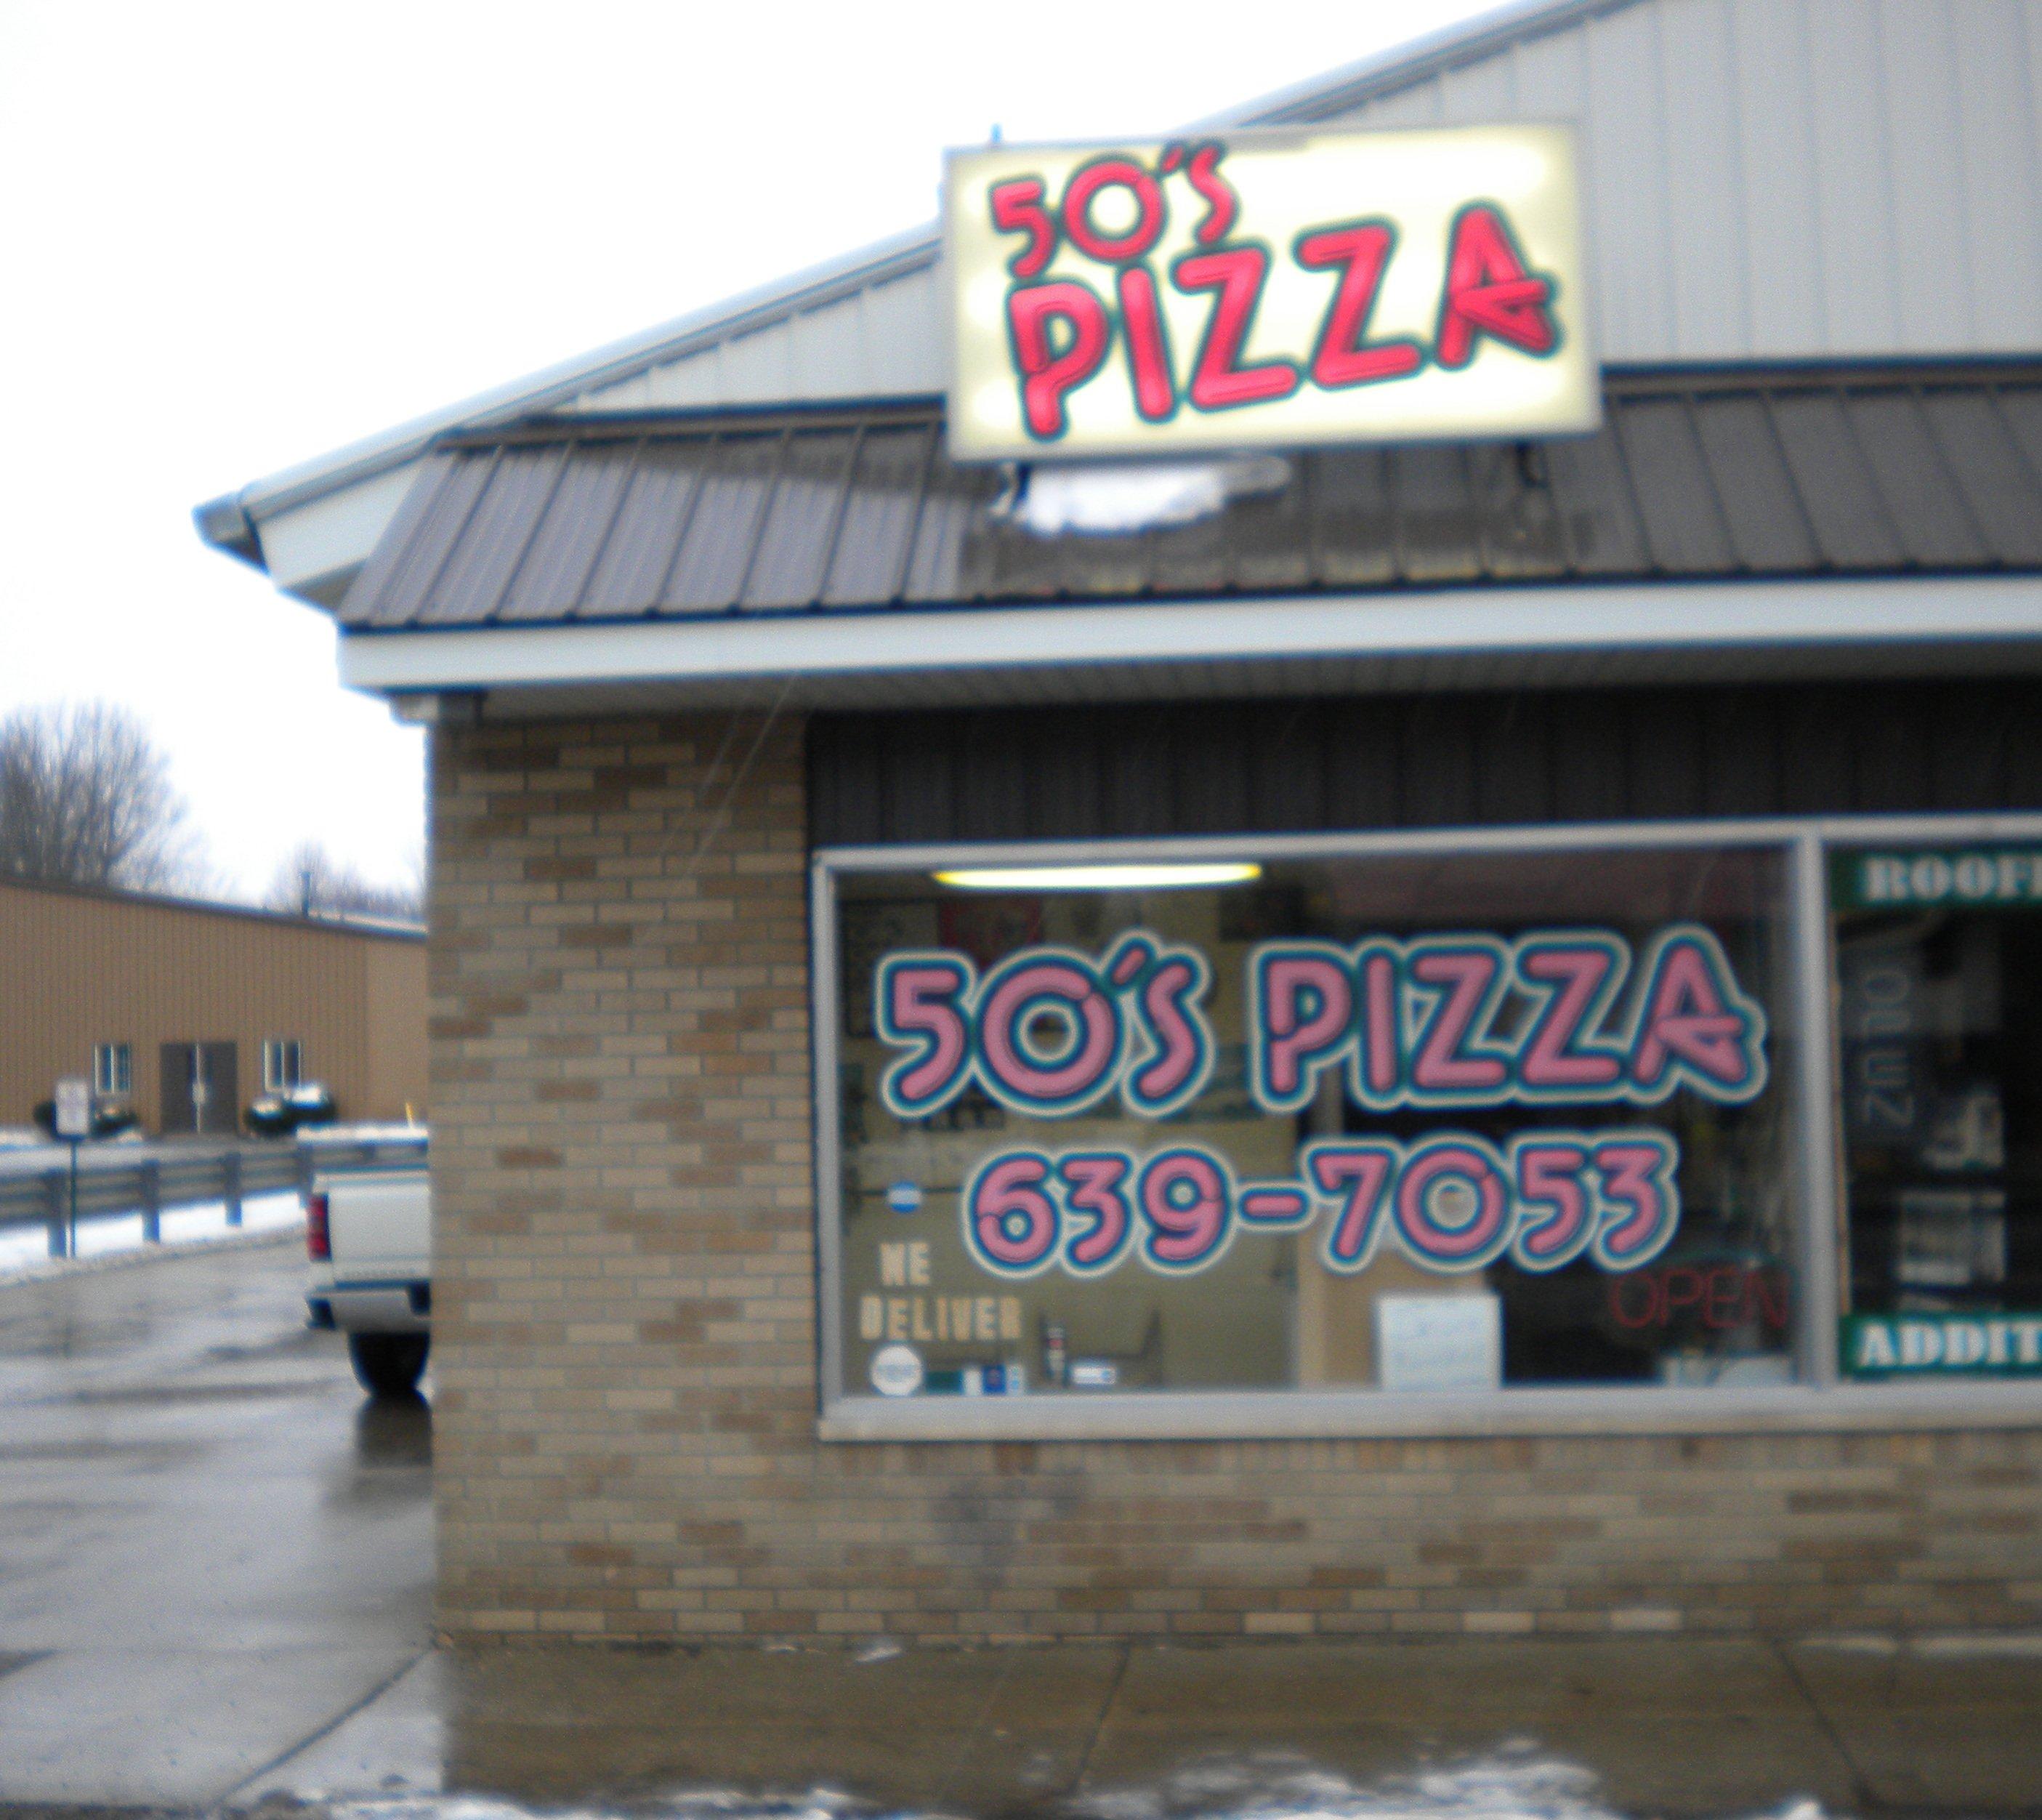 Pizza Delivery in Montrose, MI